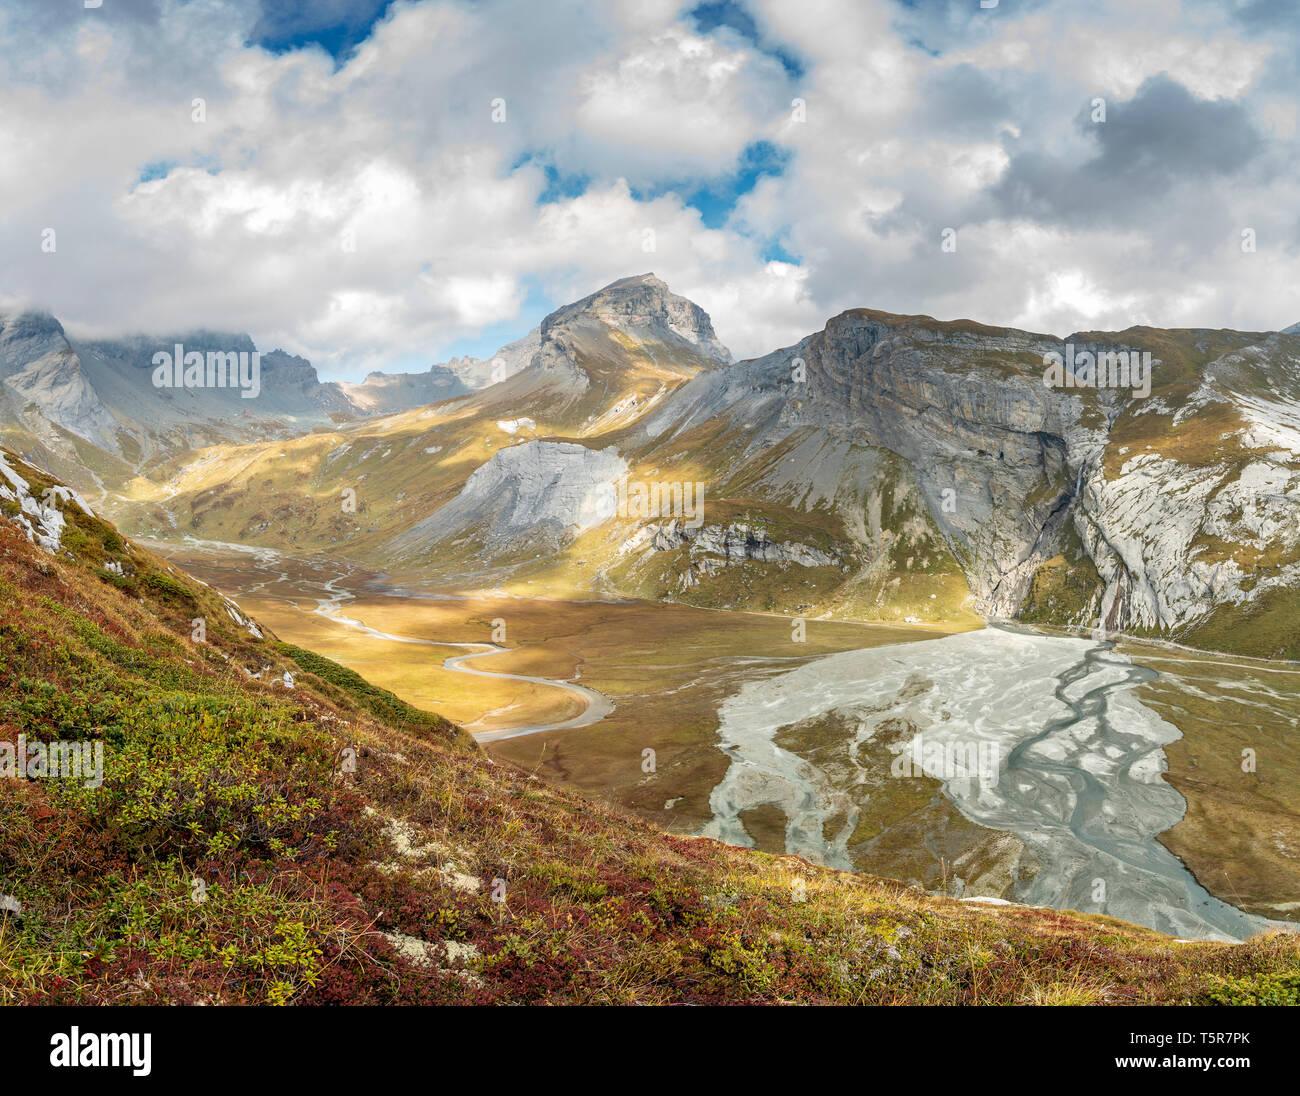 View of mountain panorama and Unterer Segnesboden, Flims, Graubünden, Switzerland - Stock Image